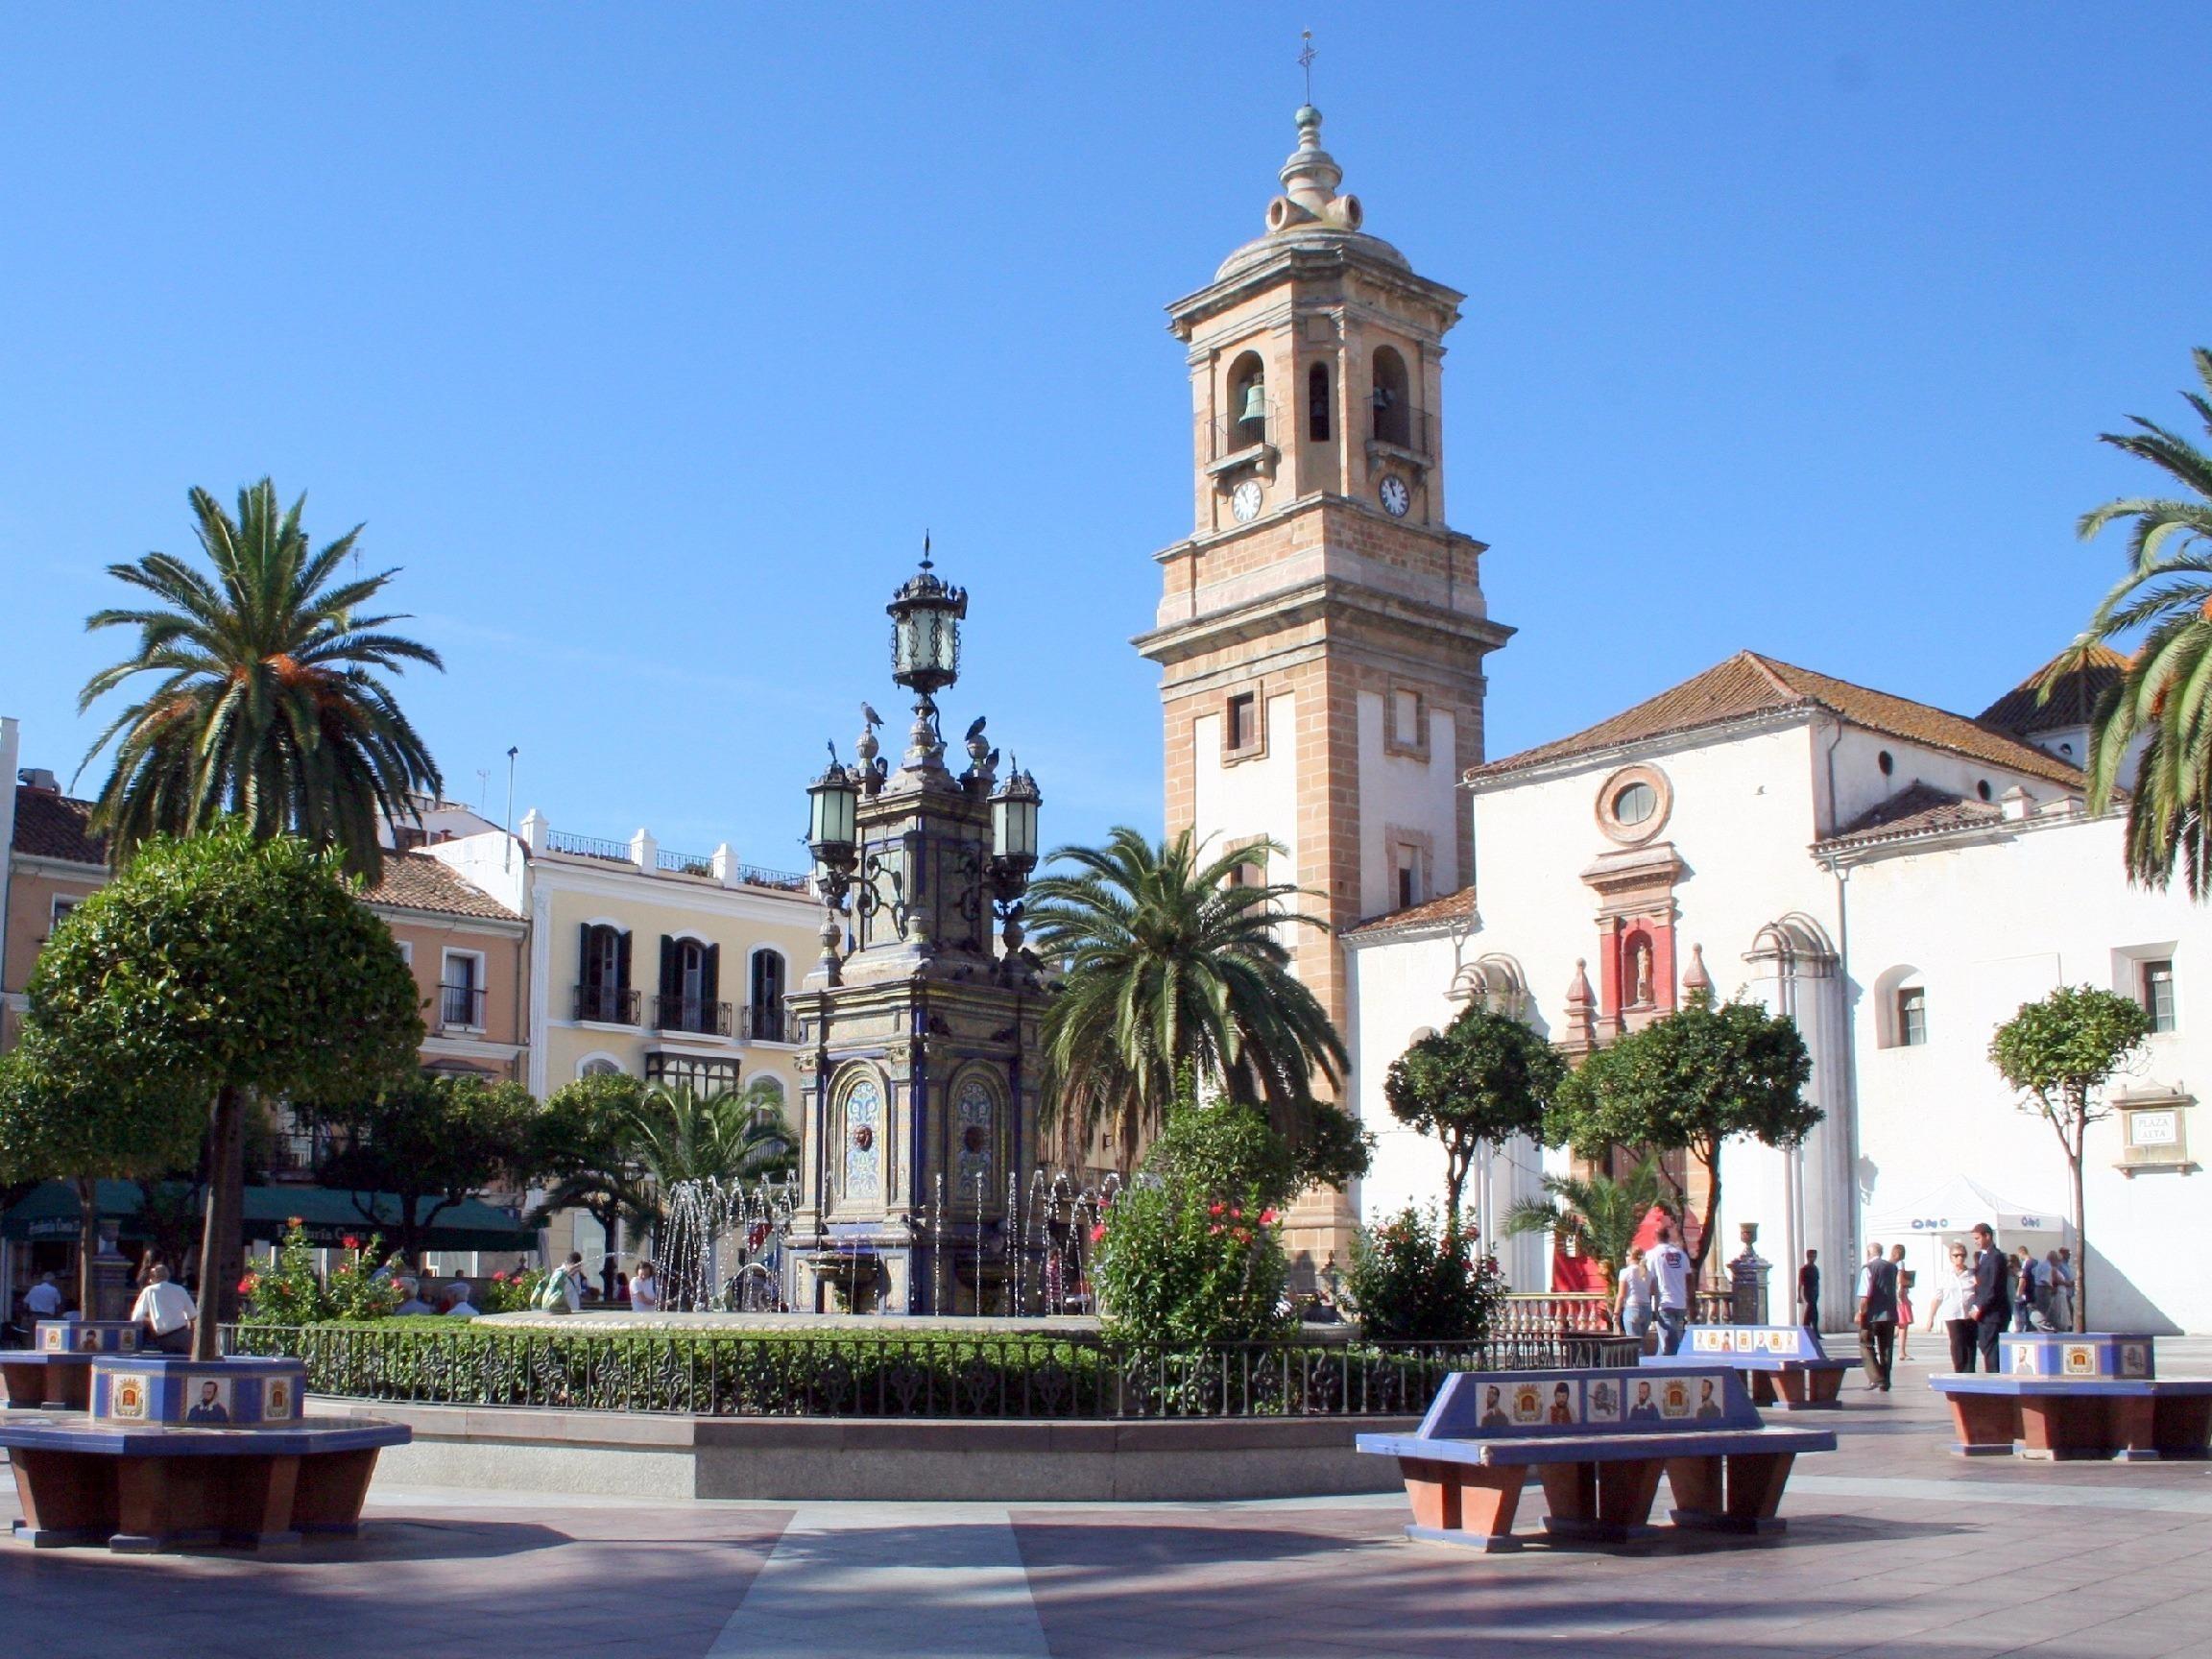 Flores a domicilio Algeciras